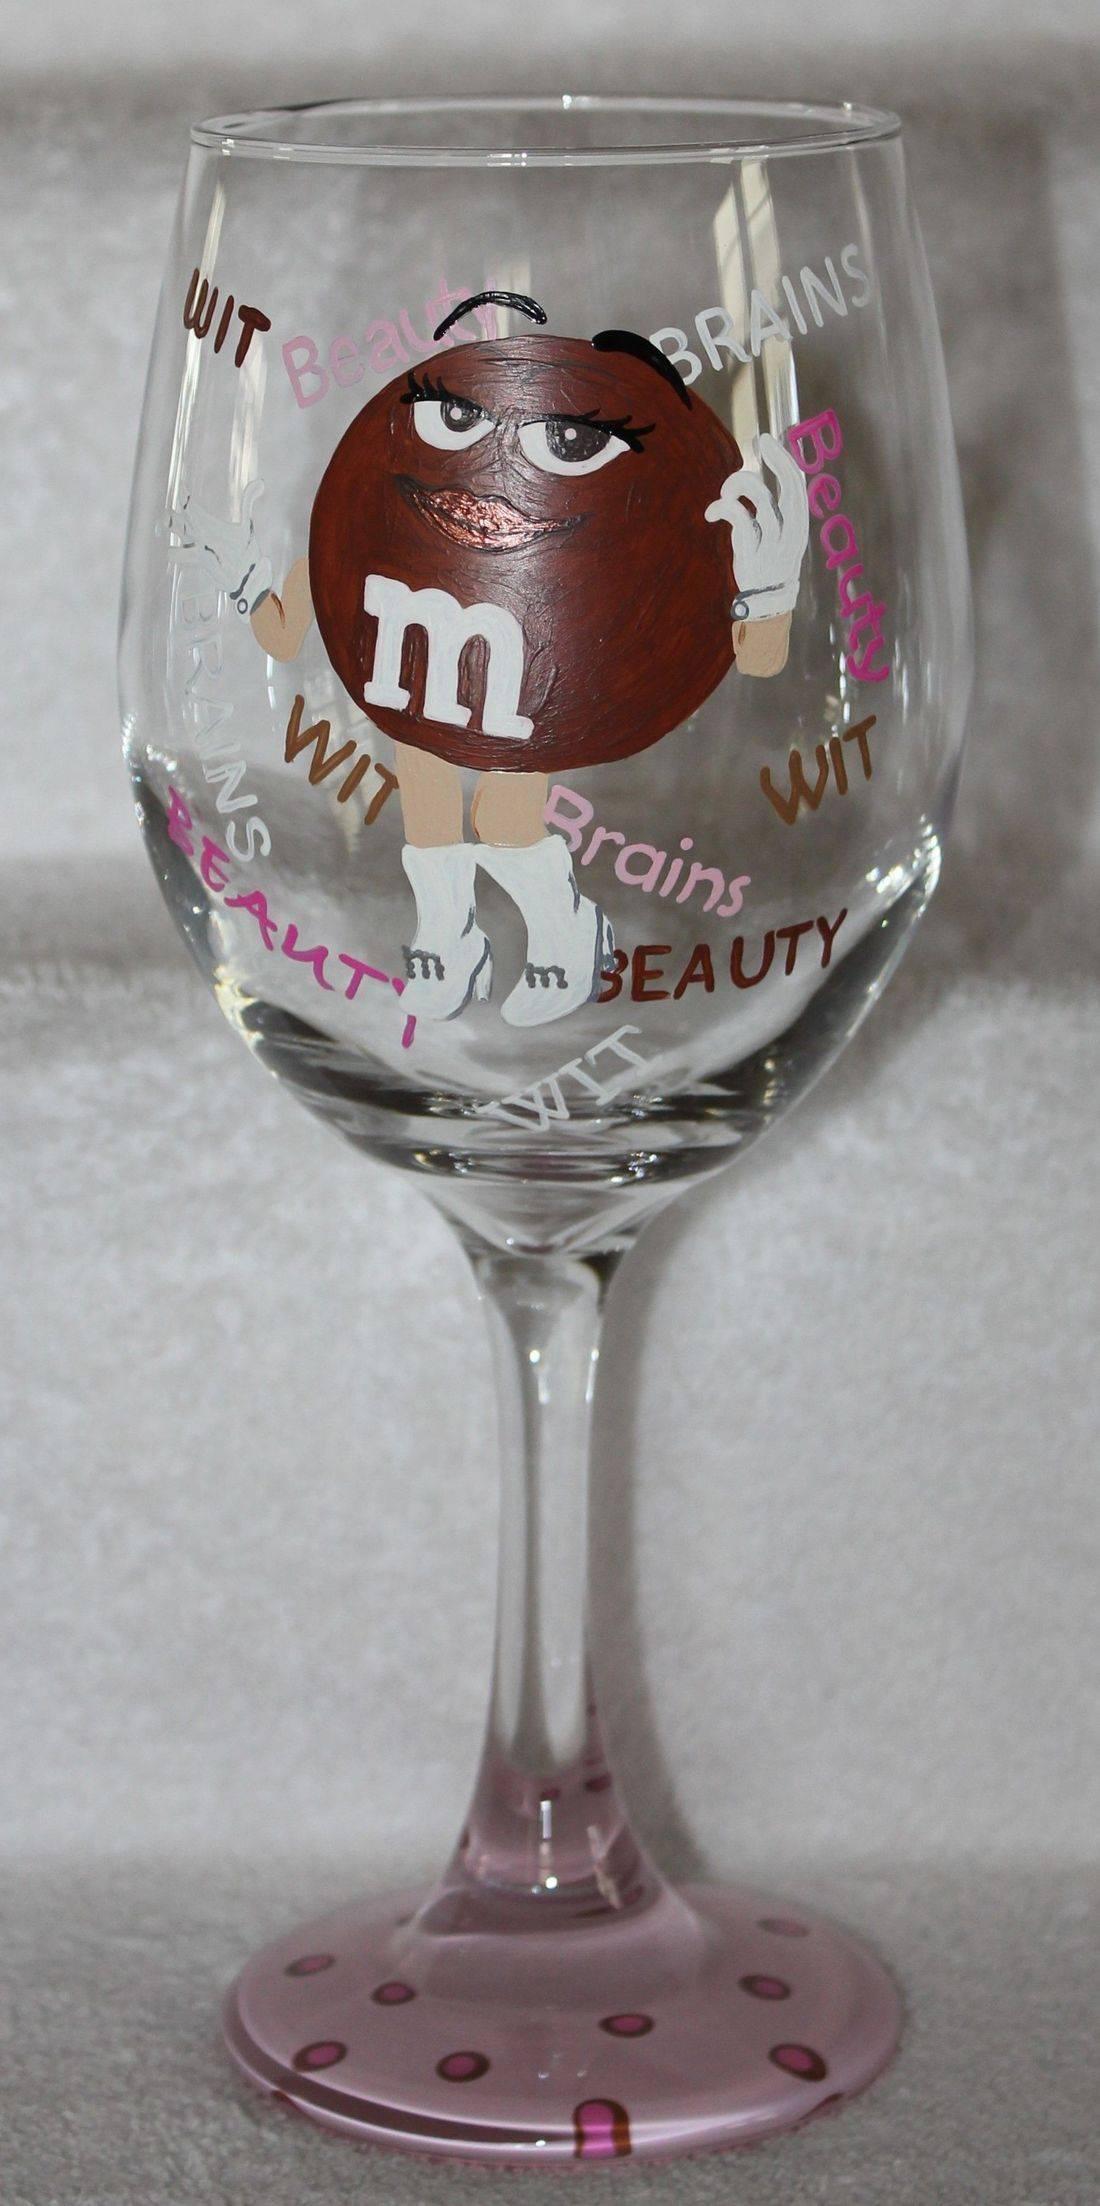 m&m wine glass, ms brown wine glass